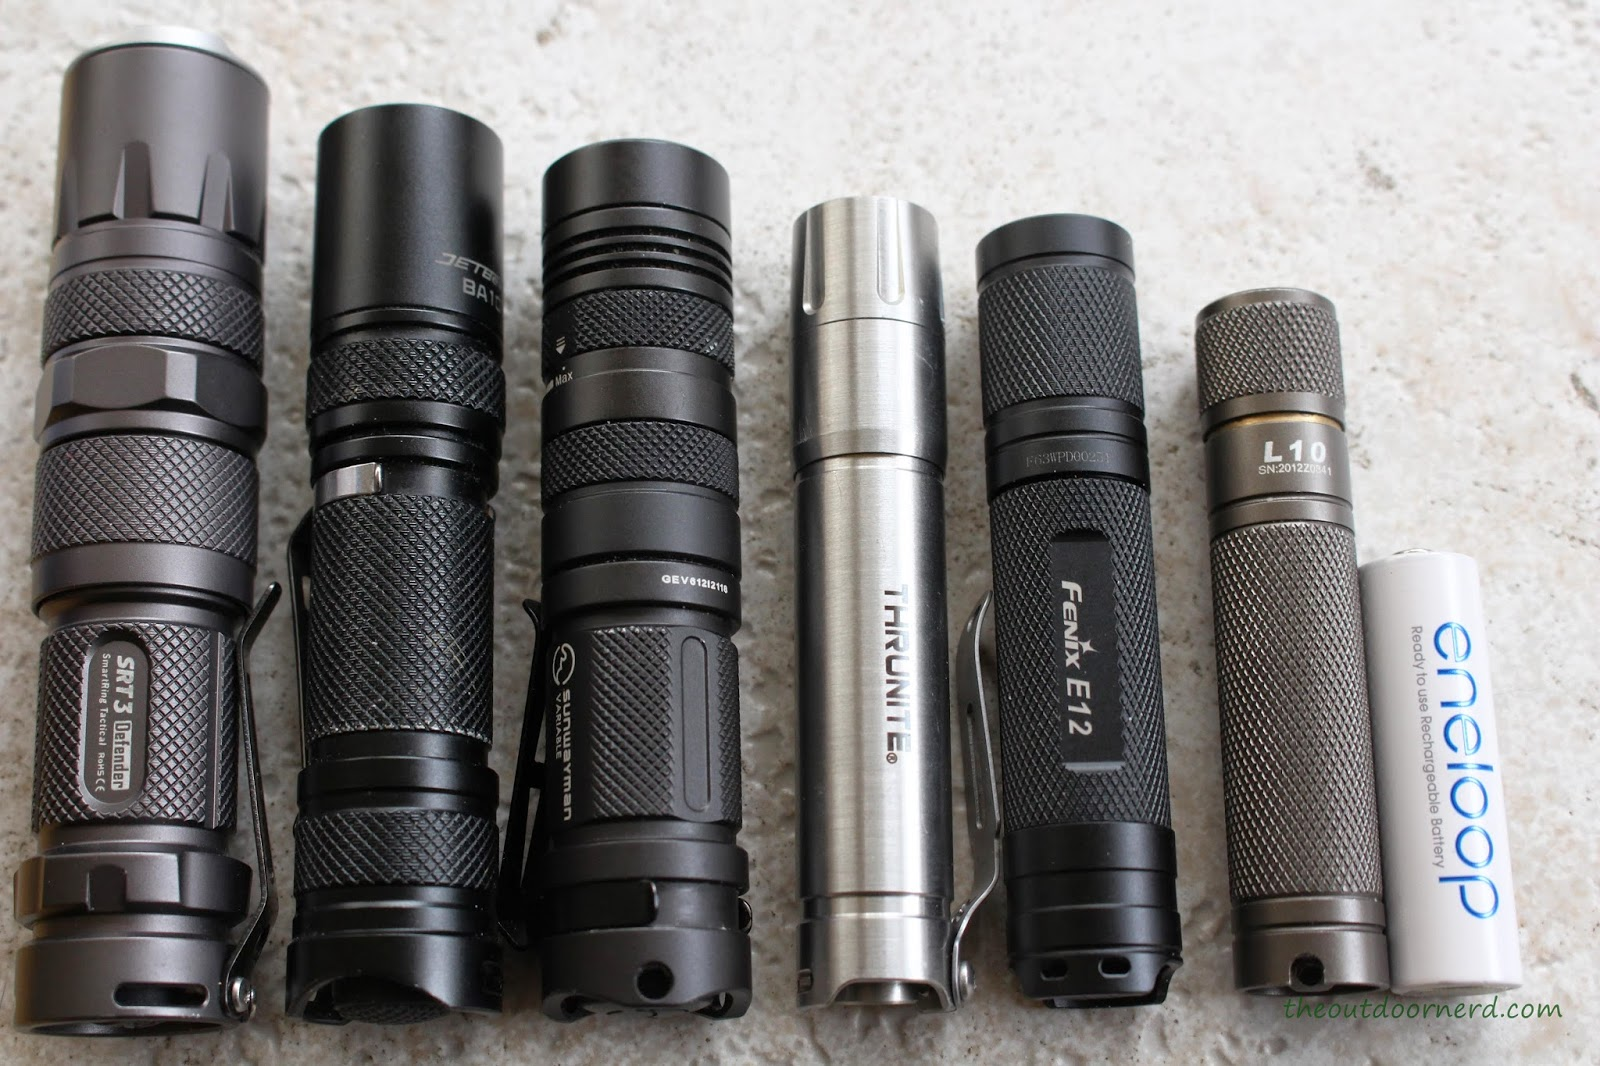 Fenix E12 1xAA EDC Flashlight With Friends